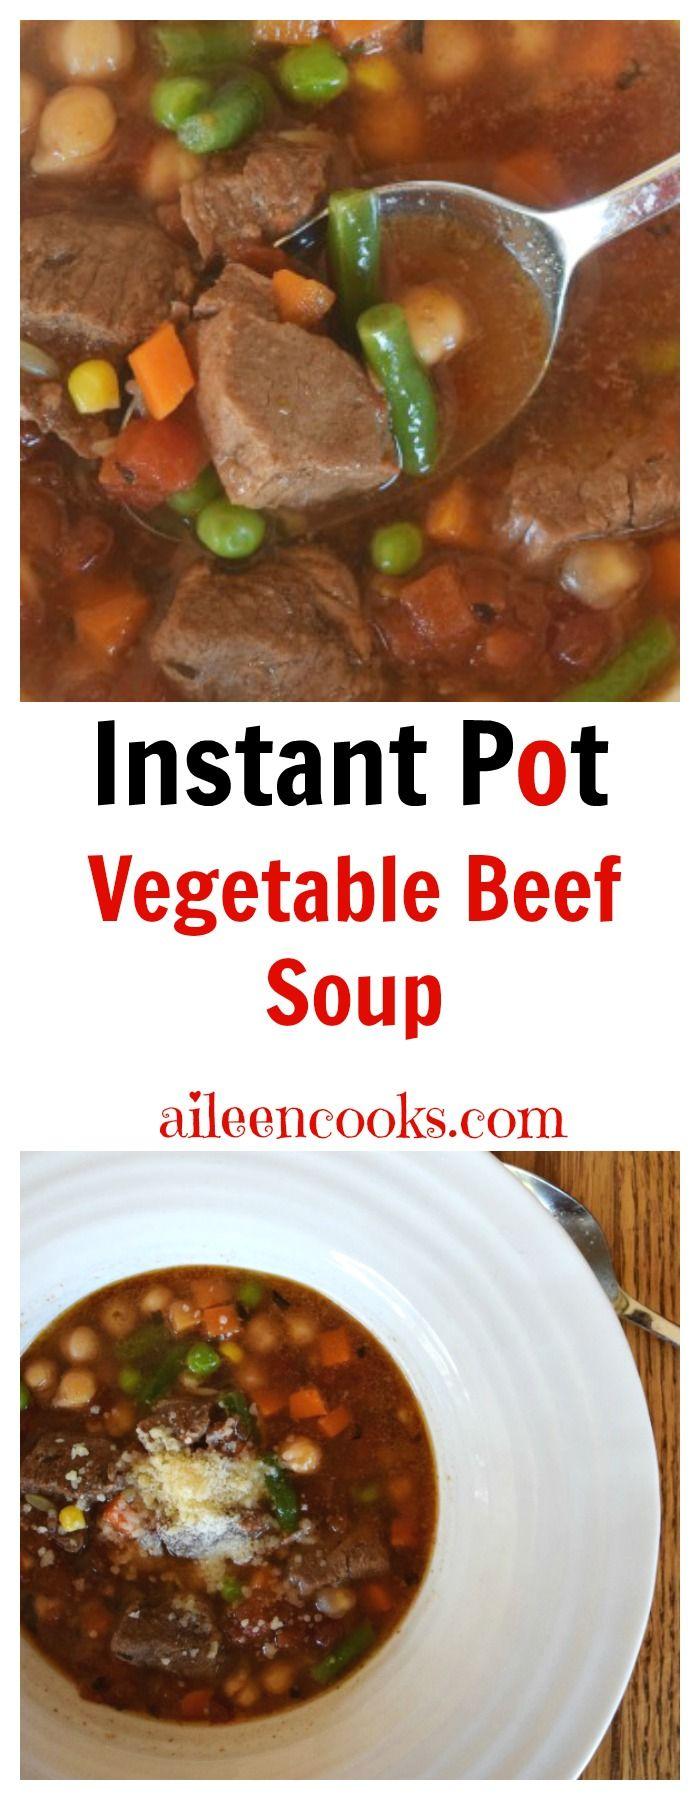 Instant Pot Vegetable Beef Soup via @aileencooks